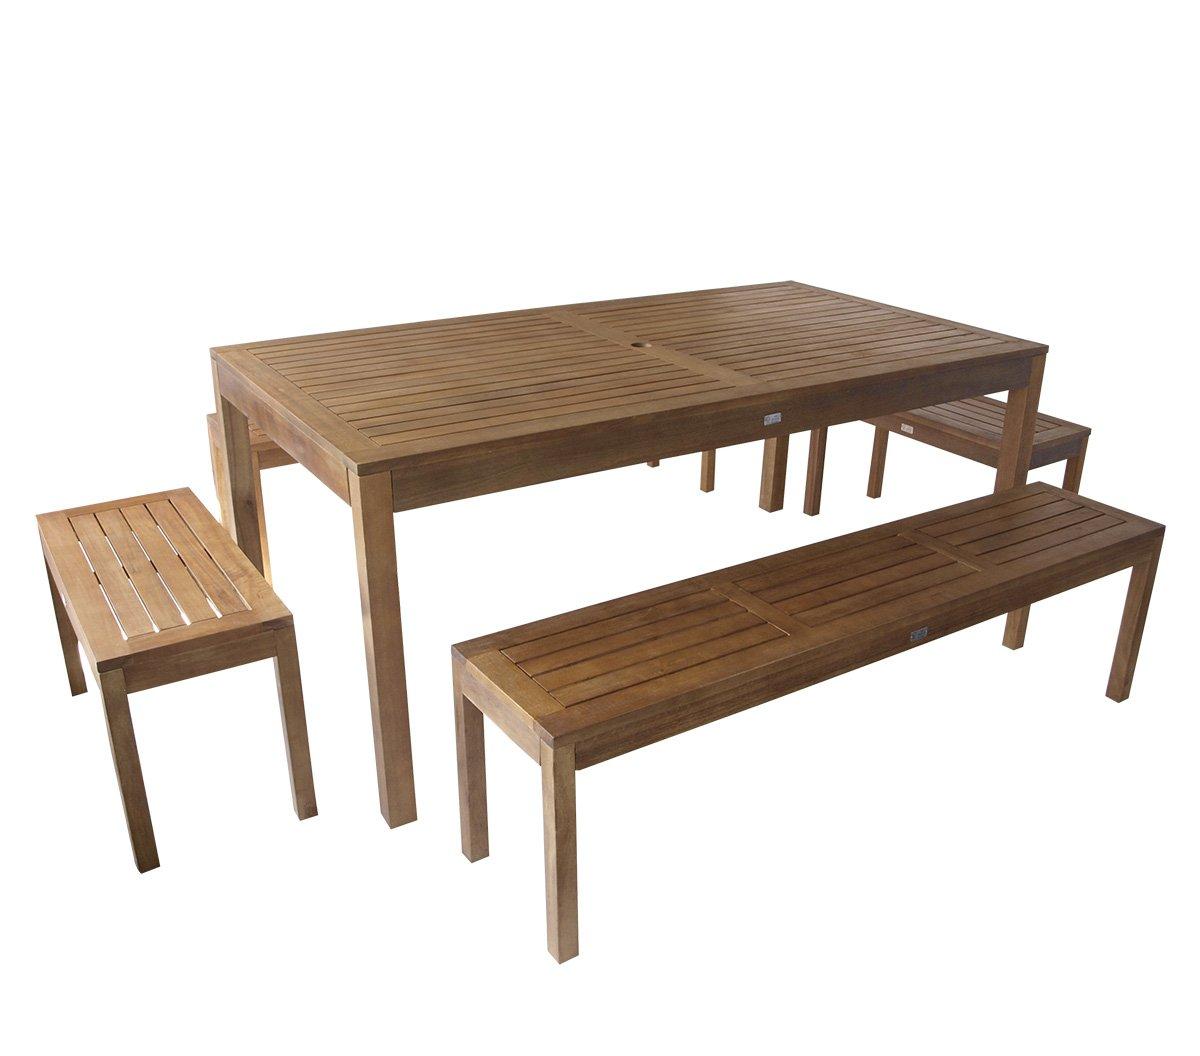 Garnitur Malmö 5-teilig 180cm im Loft-Stil, Eukalyptus Holz, FSC®-zertifiziert online kaufen